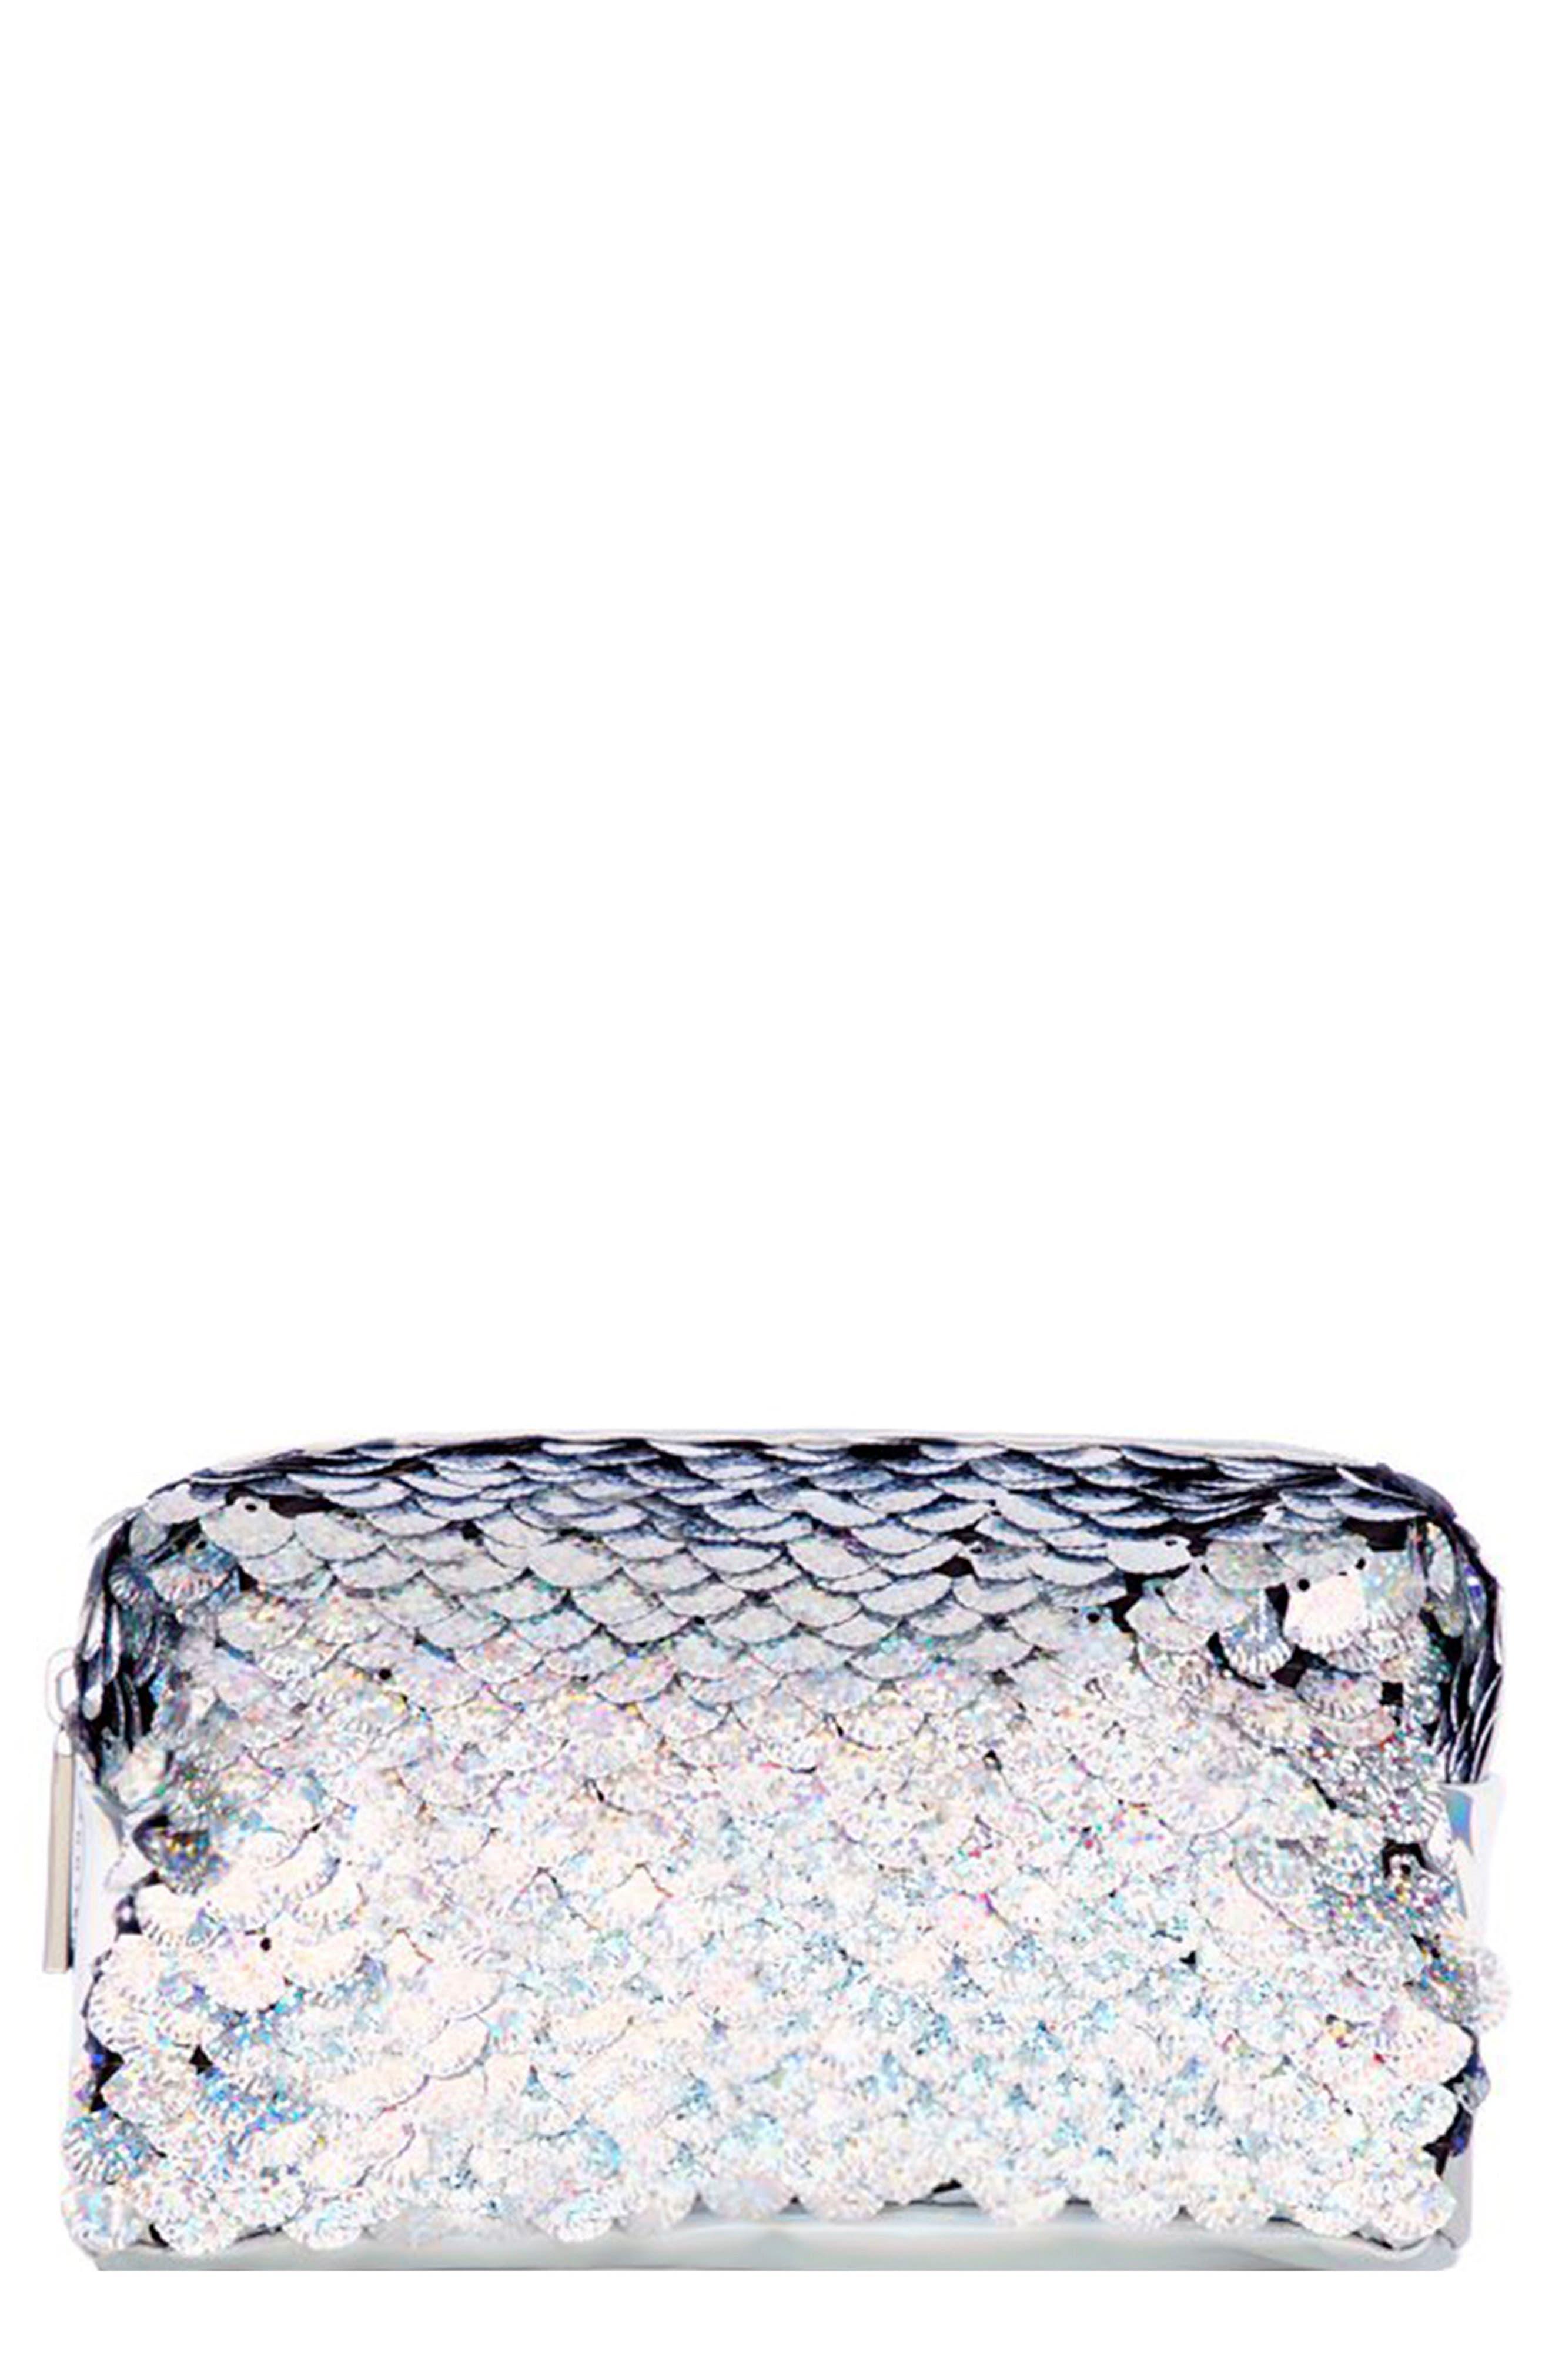 Sequin Makeup Bag,                             Main thumbnail 1, color,                             NO COLOR